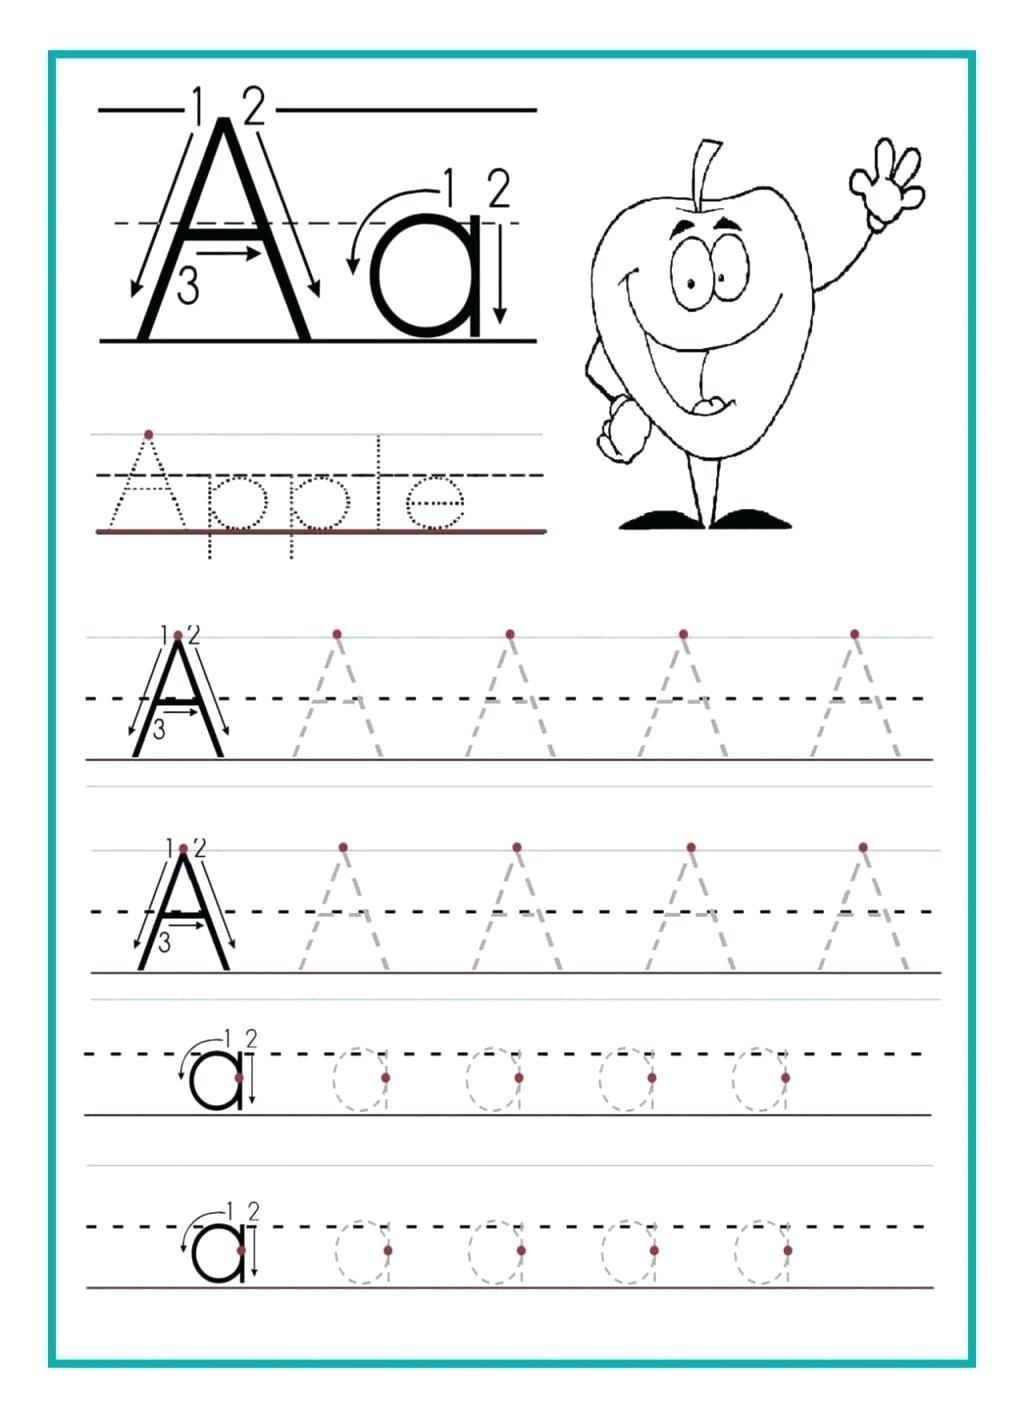 Worksheet First Grade Math Problems Idea Book Printing Games For Kindergarten English Worksheets Pdf